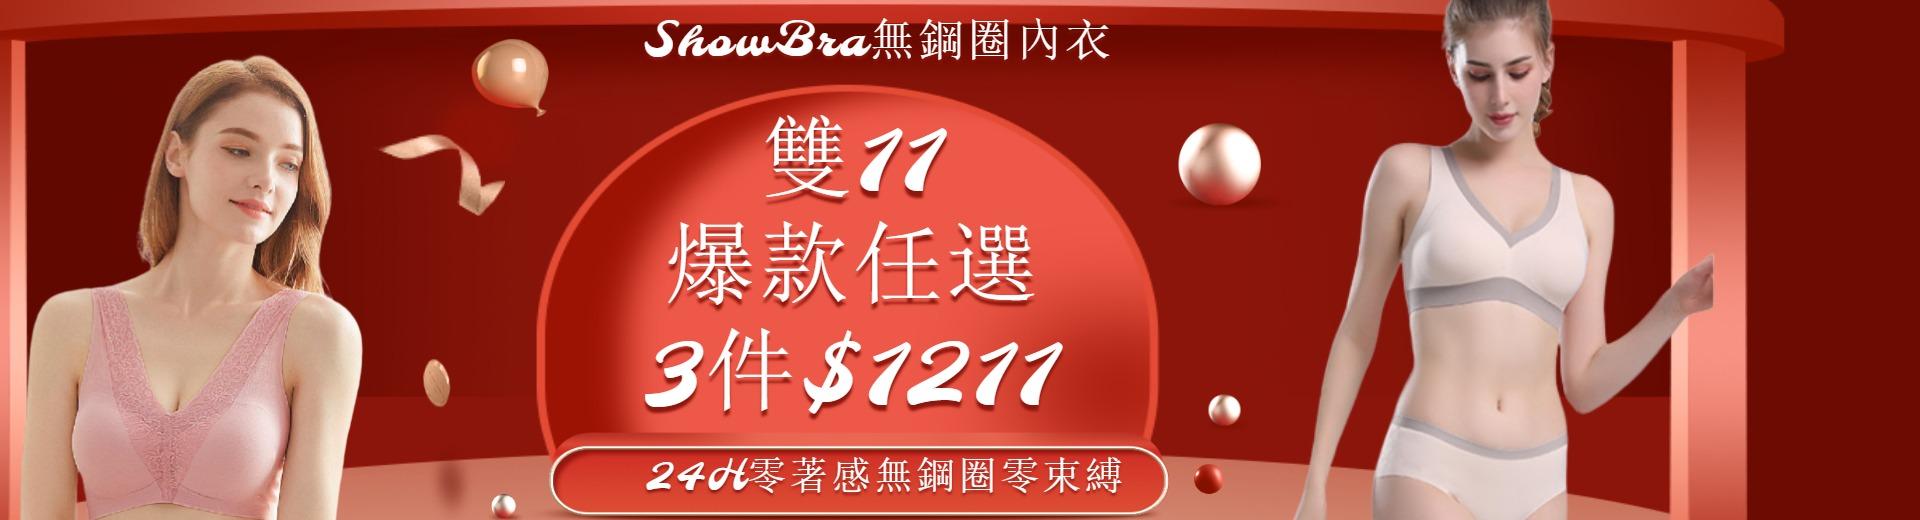 【showbra】 無鋼圈內衣任選兩件$990